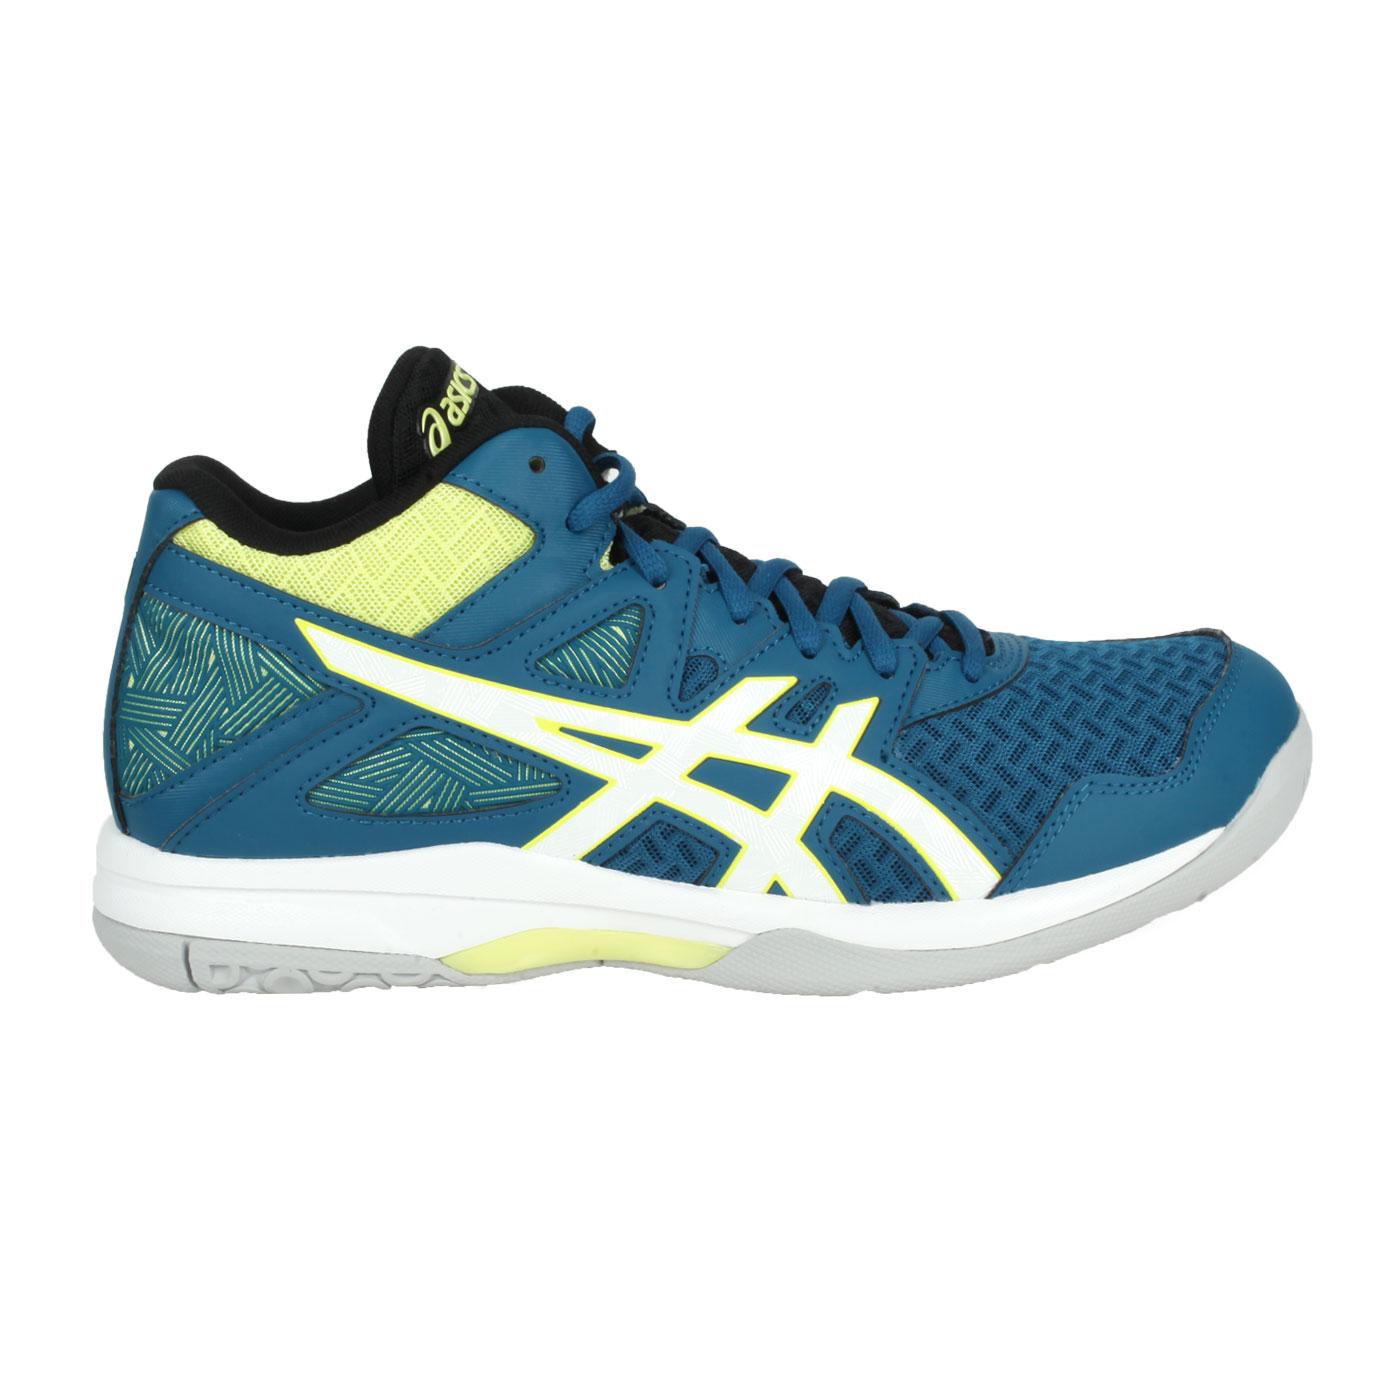 ASICS 男款排羽球鞋  @GEL-TASK MT 2@1071A036-401 - 藍綠白黃